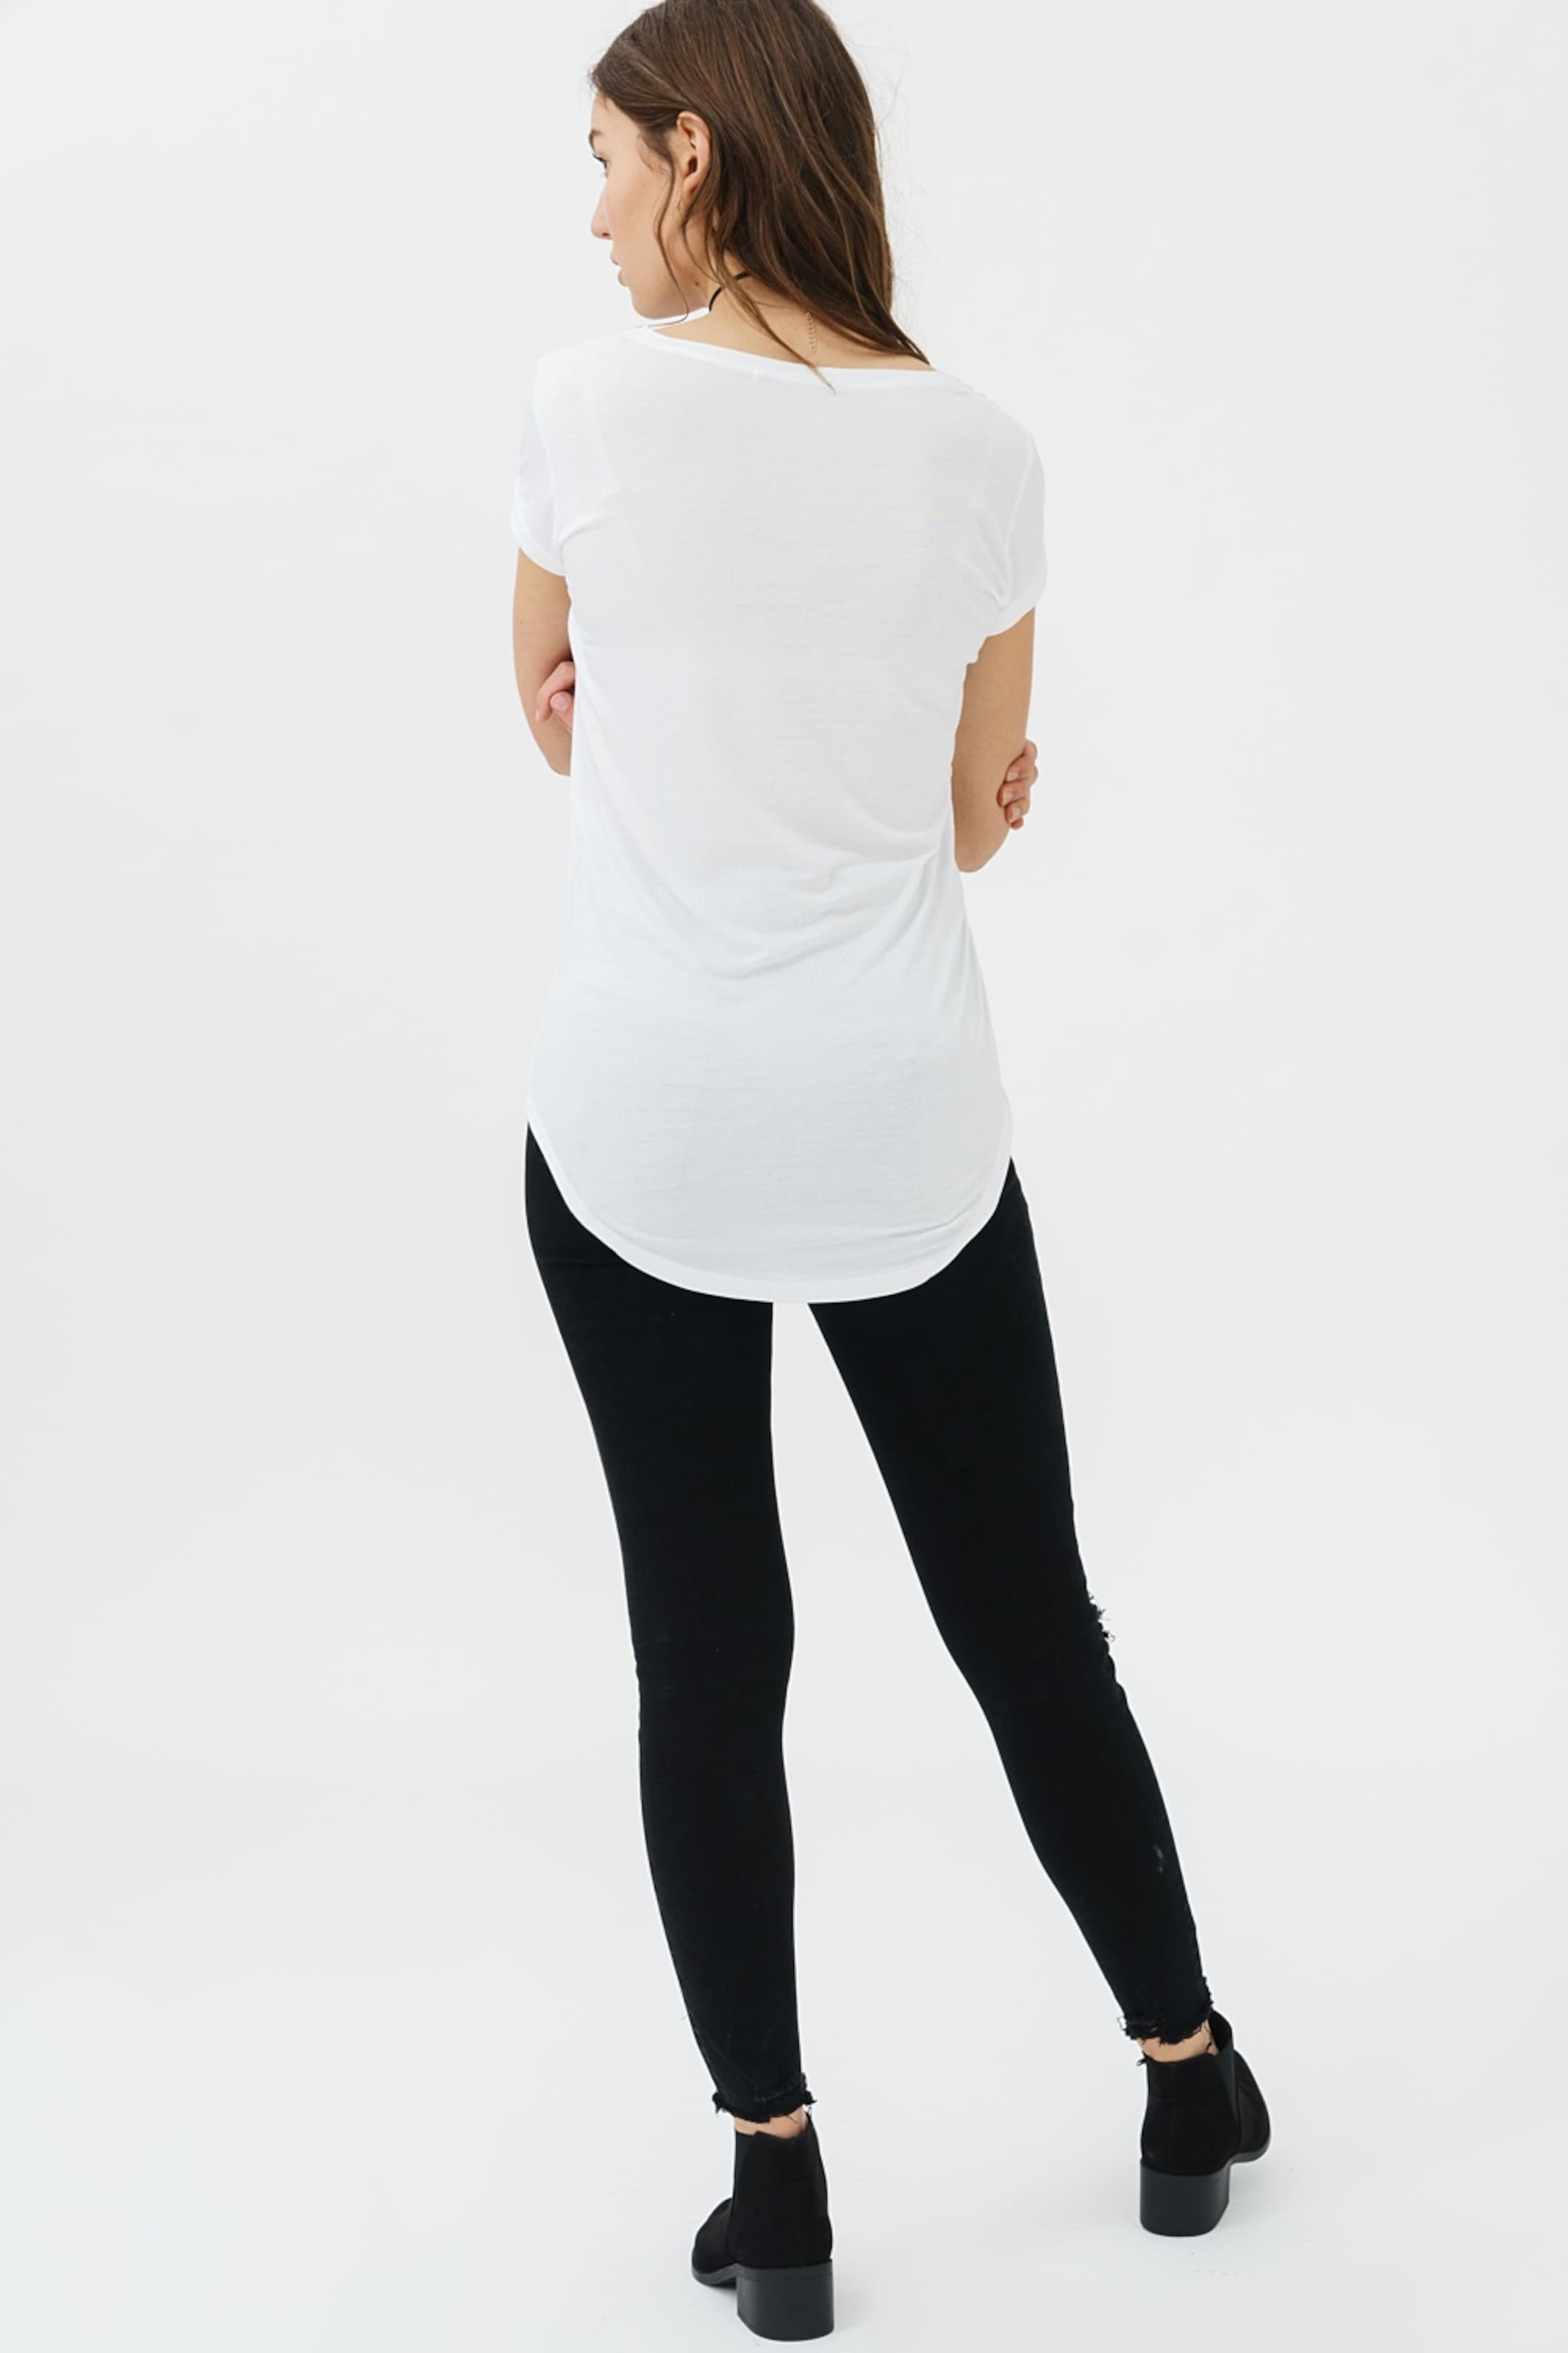 HelllilaSchwarz Weiß Trueprodigy shirt 'lynette' In T 3A5R4jLqSc